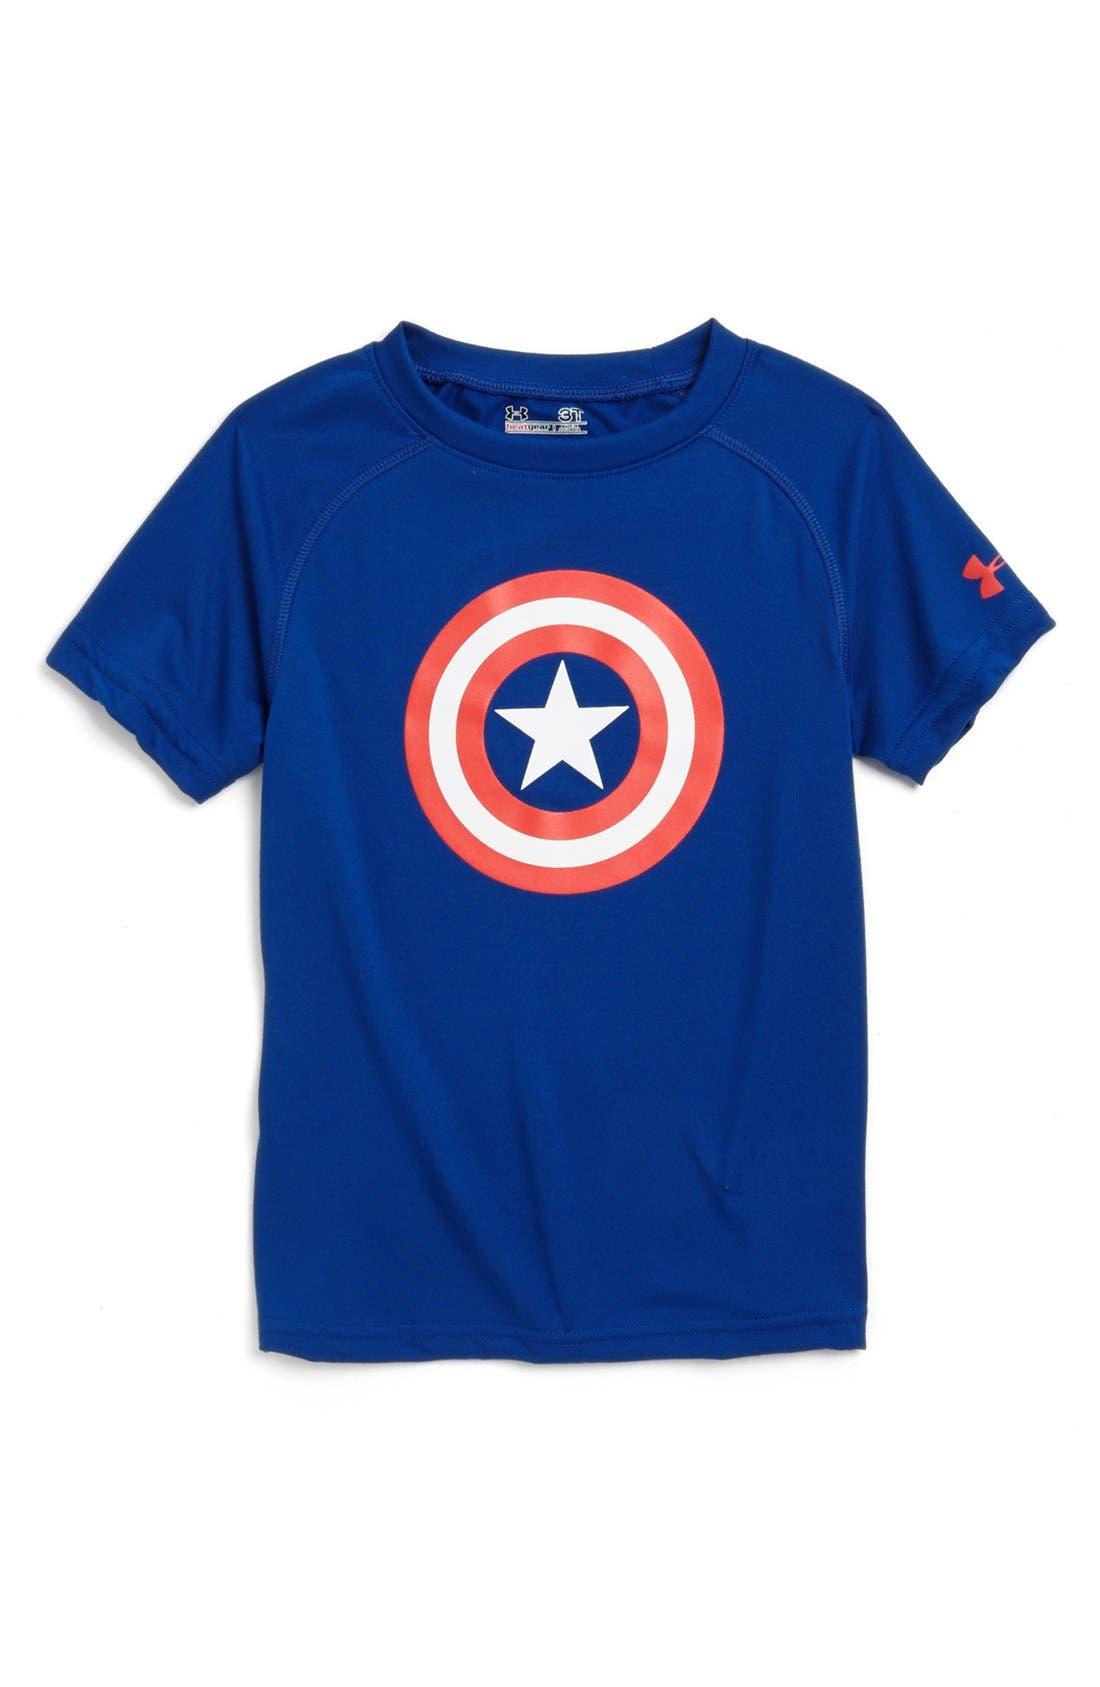 Main Image - Under Armour 'Alter Ego - Captain America' HeatGear® T-Shirt (Little Boys)